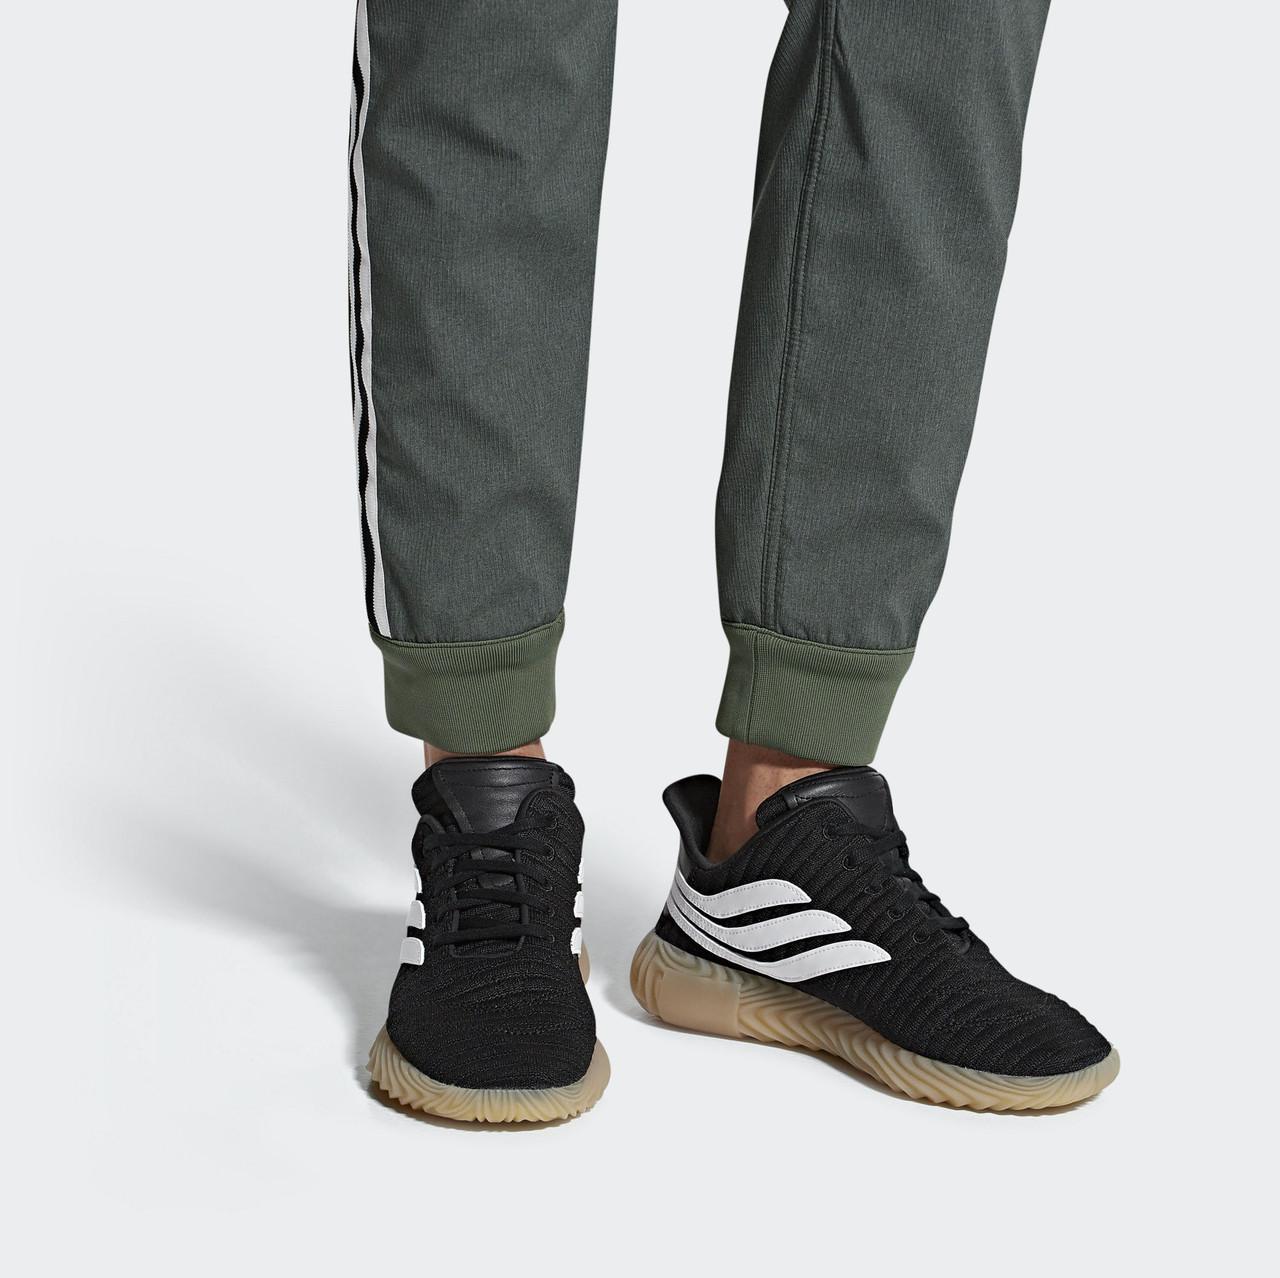 Кроссовки Adidas Sobakov US 9